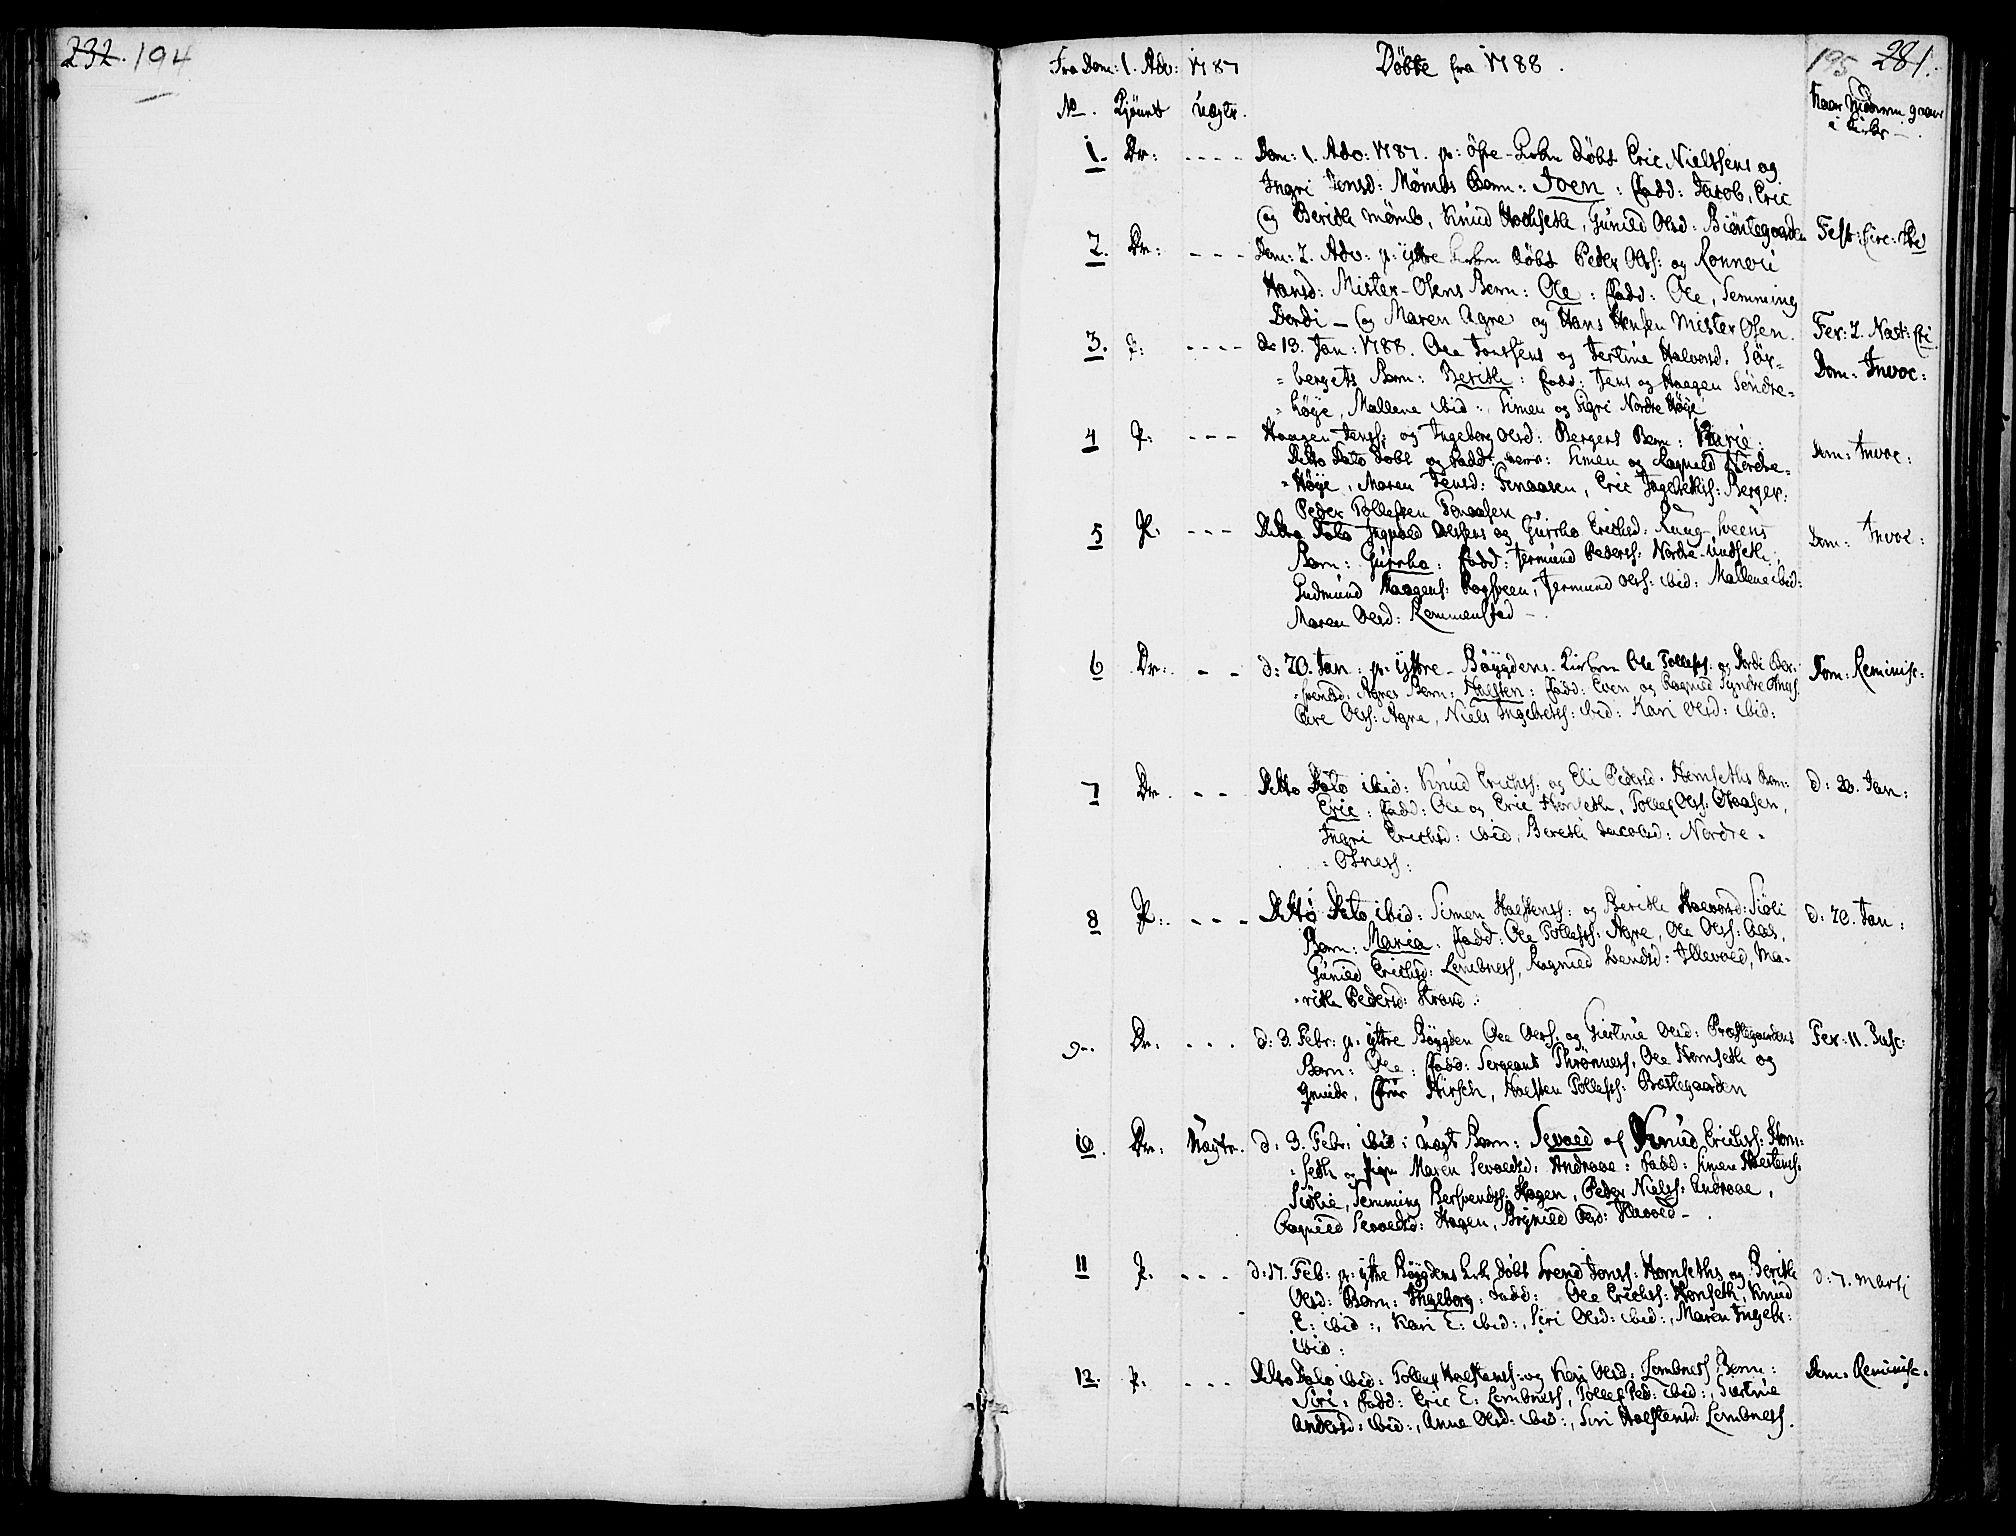 SAH, Rendalen prestekontor, H/Ha/Haa/L0002: Ministerialbok nr. 2, 1788-1814, s. 194-195